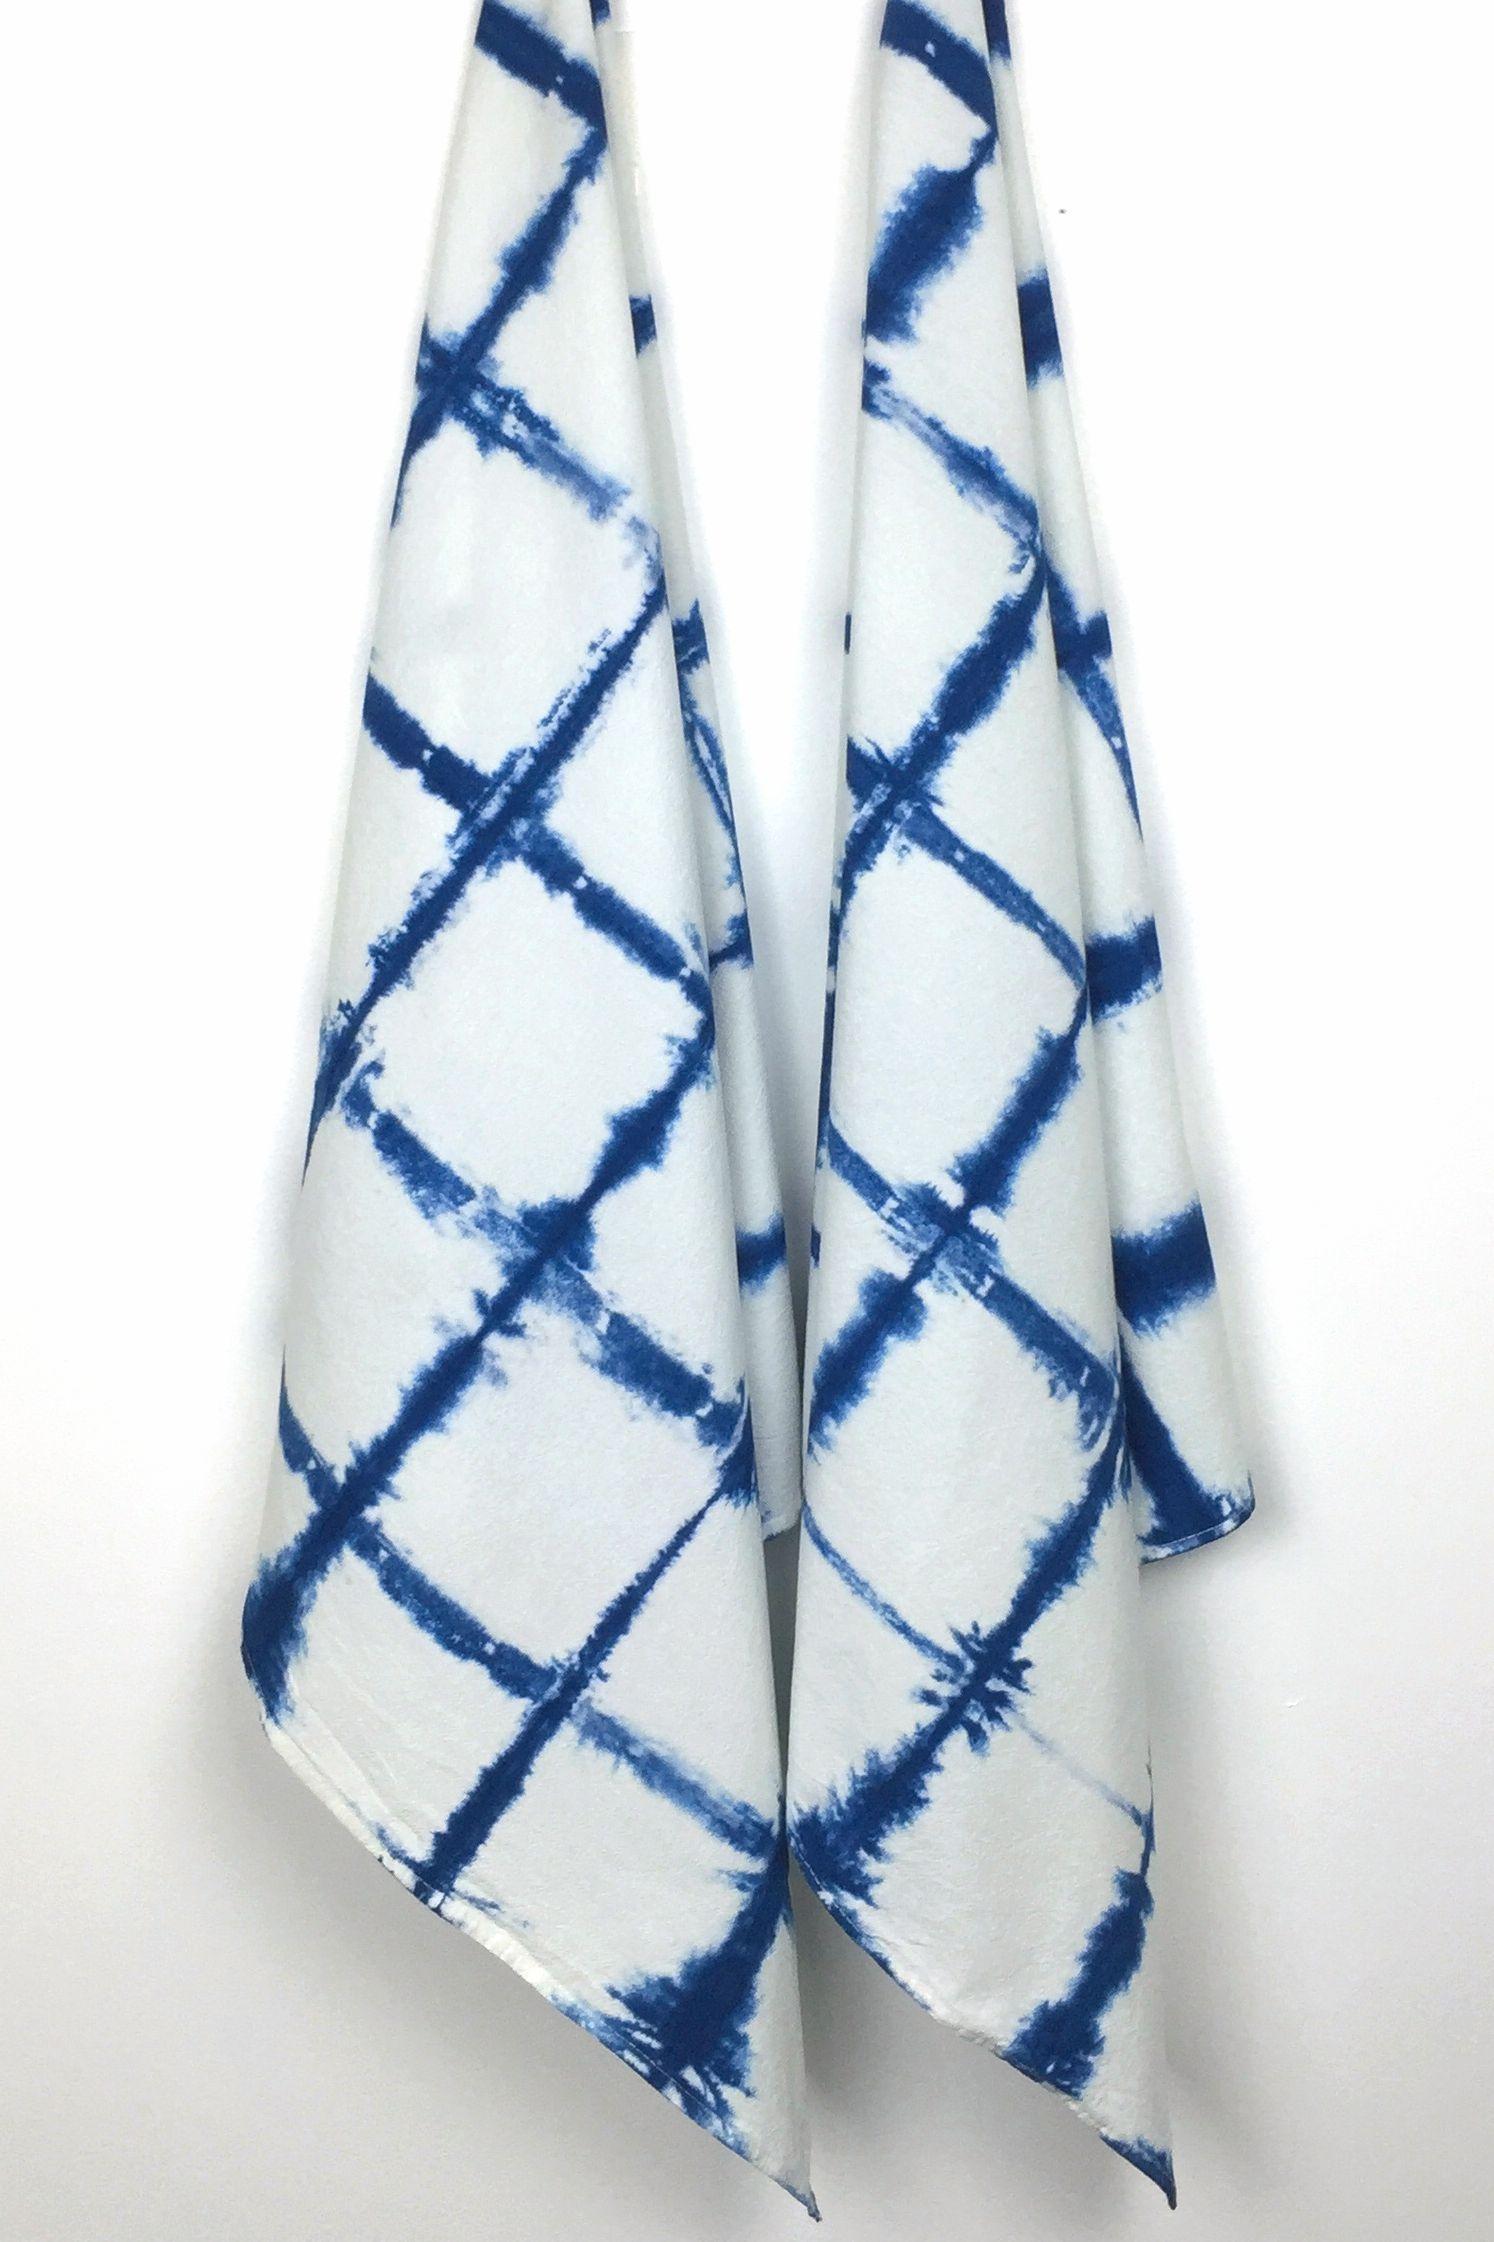 Indigo Shibori Tea Towel